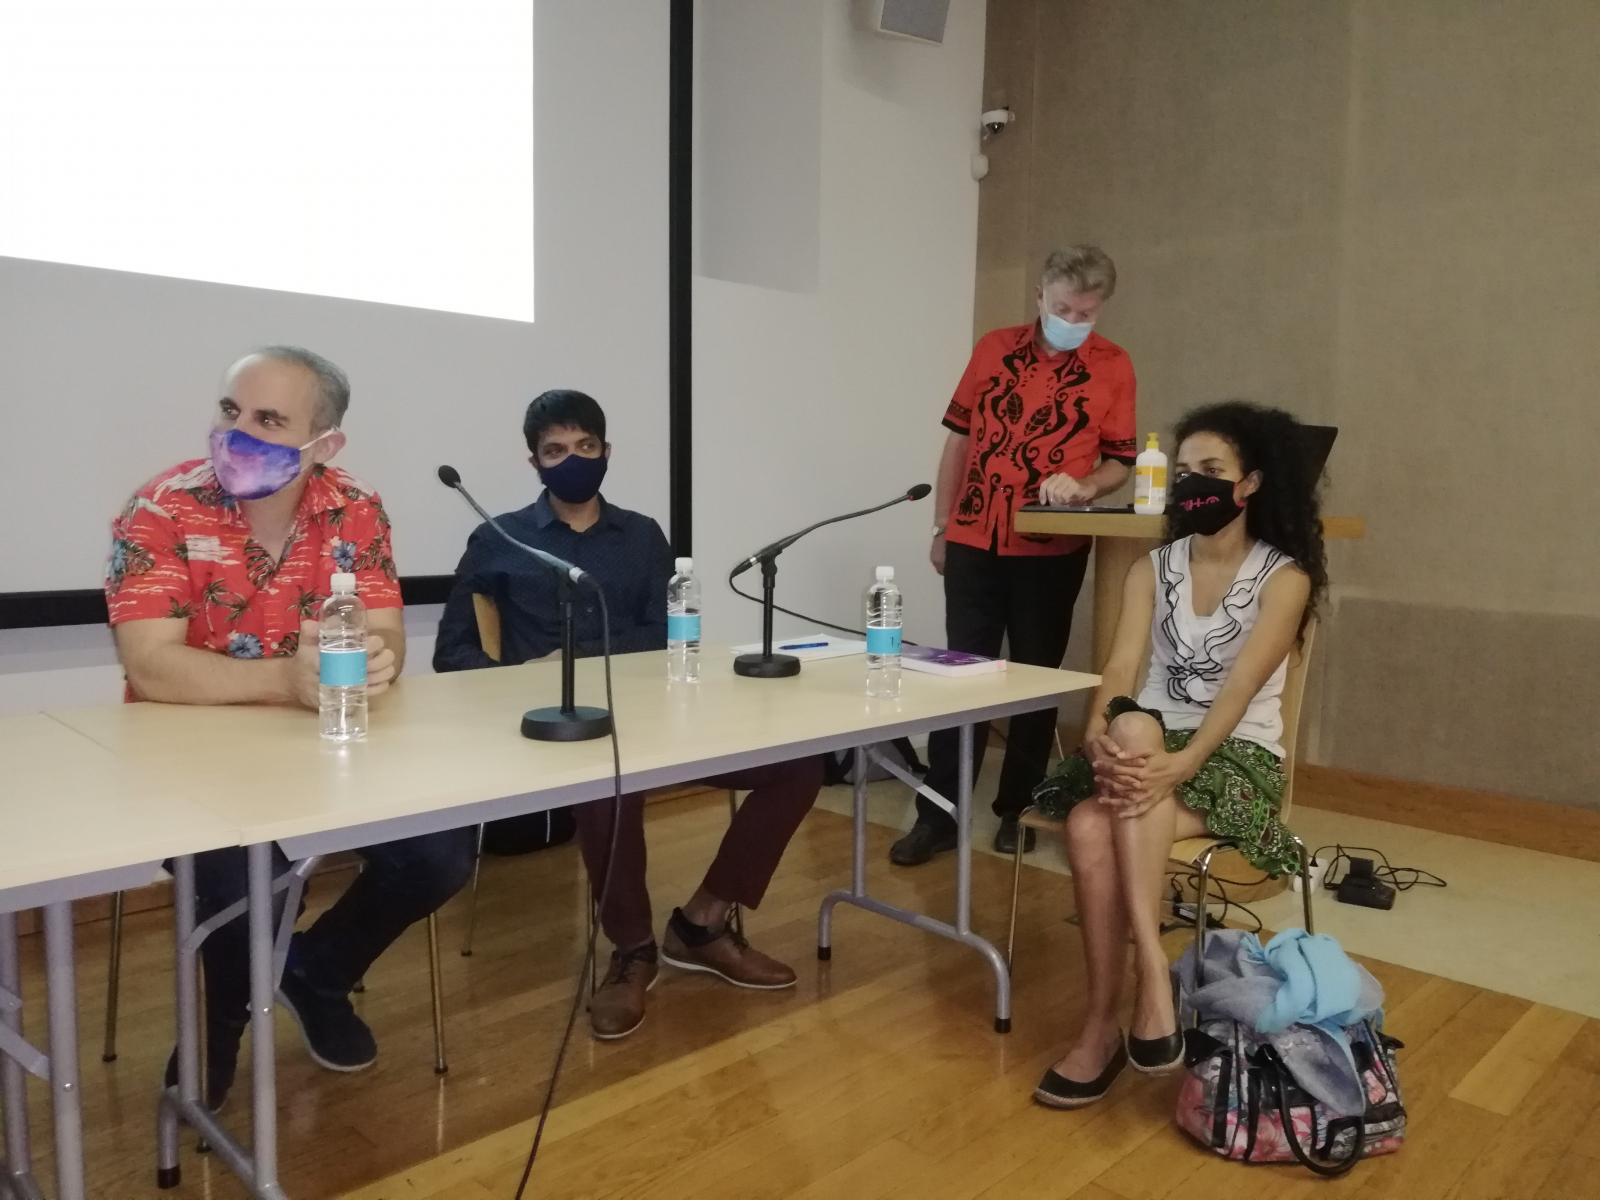 Simpozij Glasba in manjšine – Okrogla miza 1: Carlos Yoder, Bharath Ranganathan, Svanibor Pettan, Dalanda Diallo. Ljubljana, 28. 8. 2020. Foto: U. Šivic.